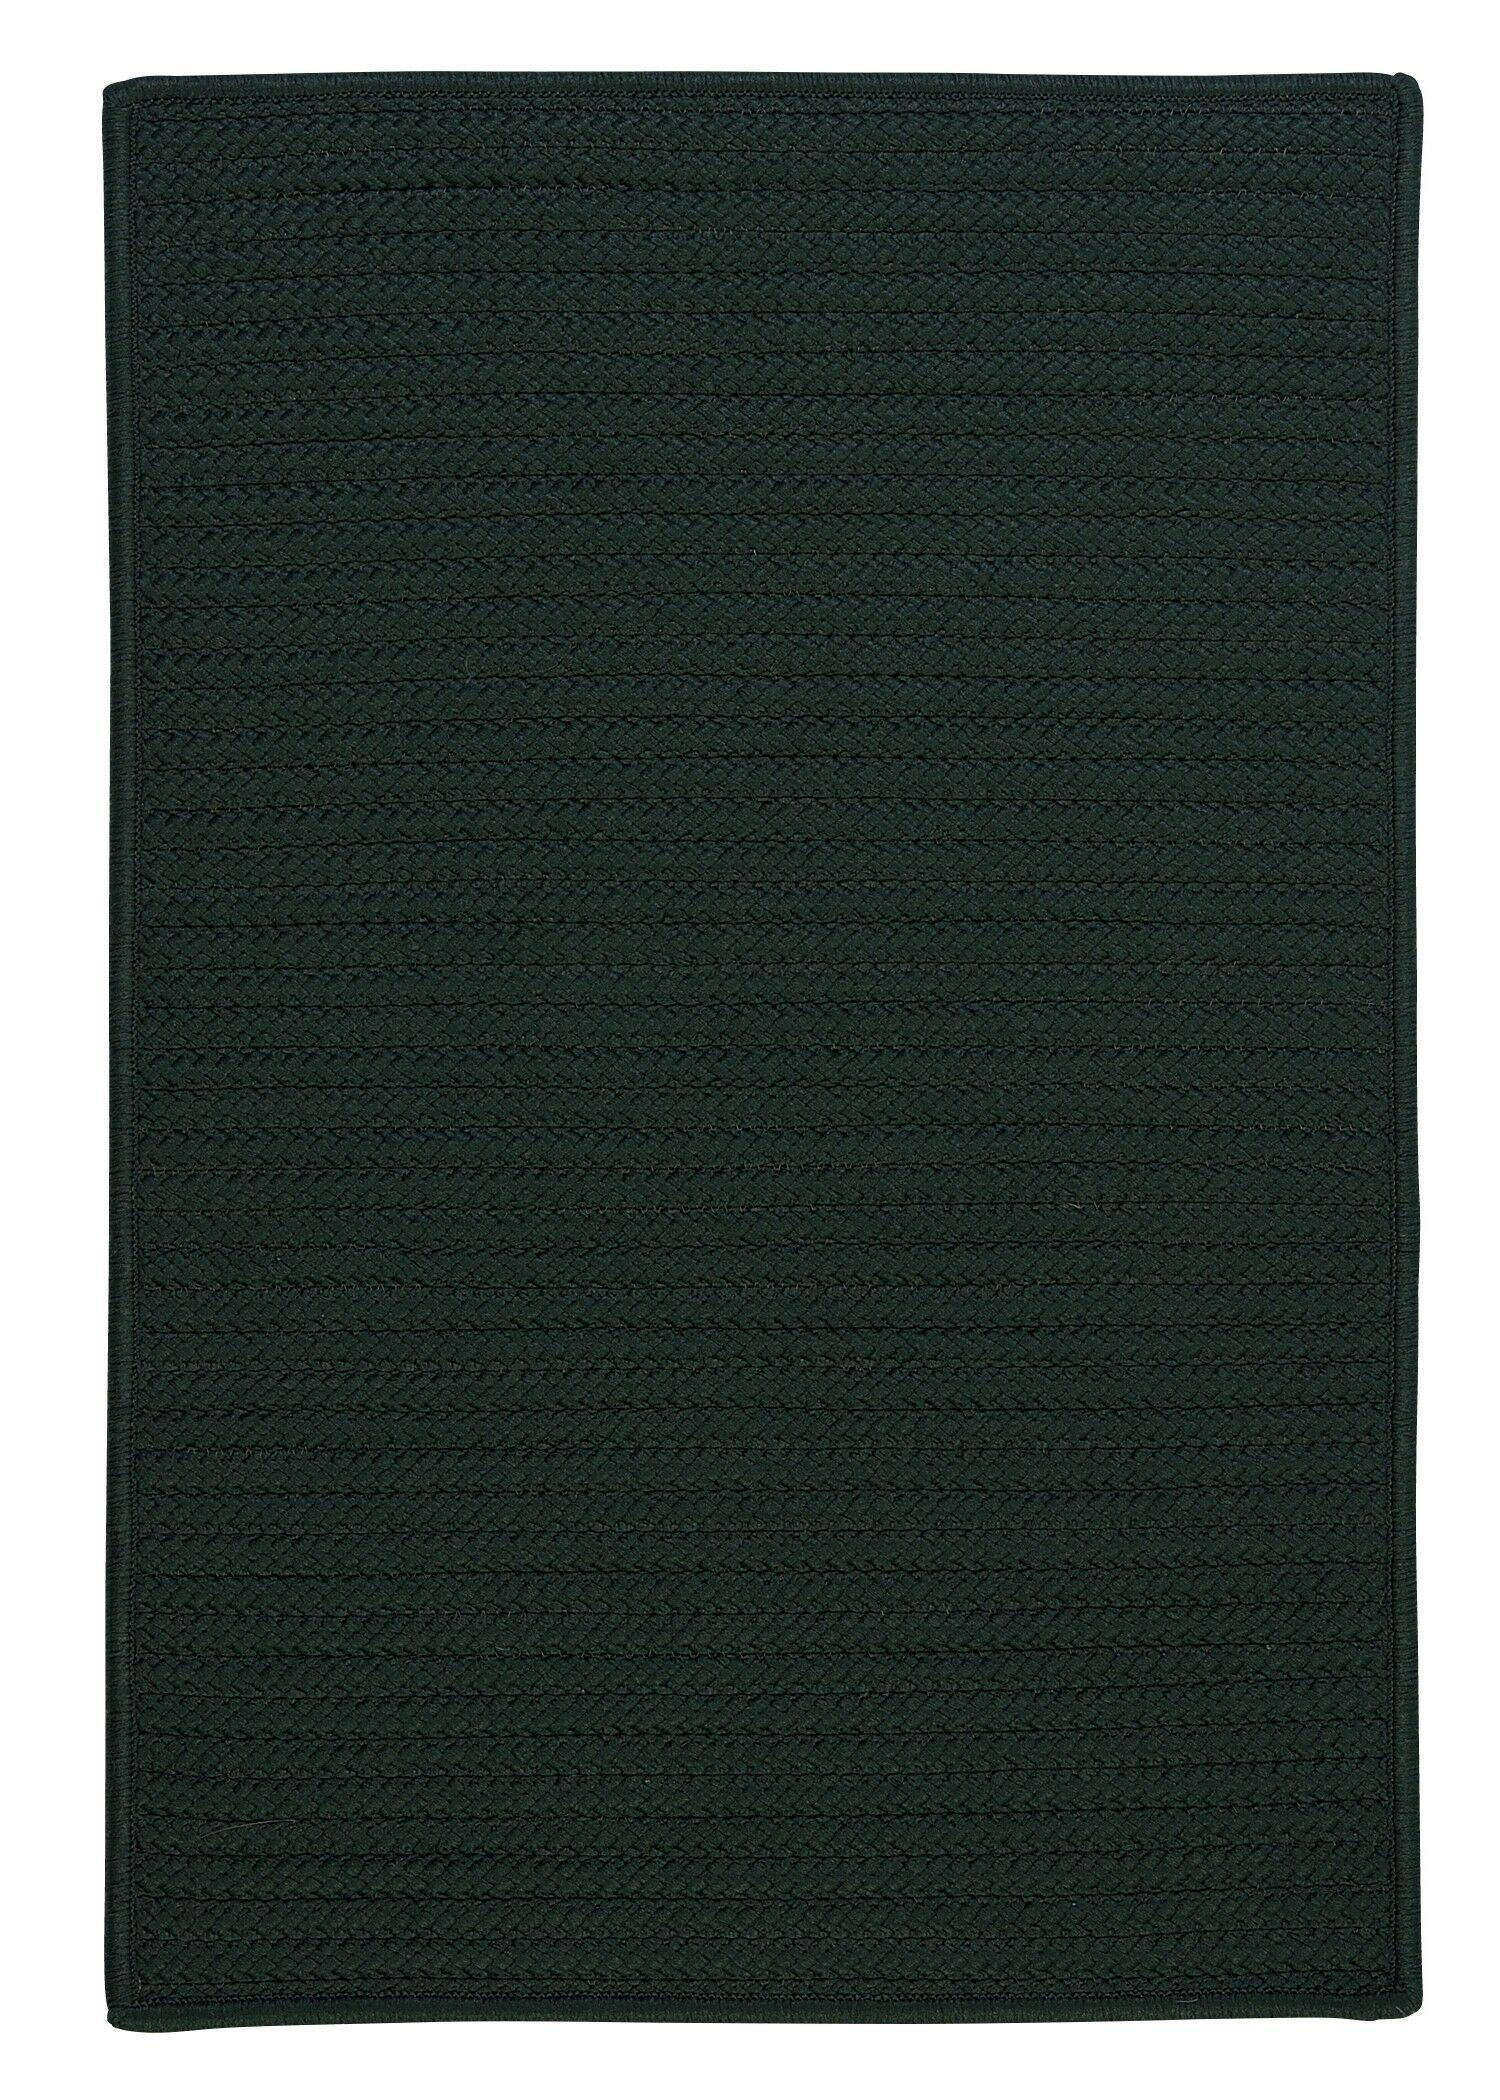 Gilmour Dark Green Solid Indoor/Outdoor Area Rug Rug Size: Rectangle 12' x 15'